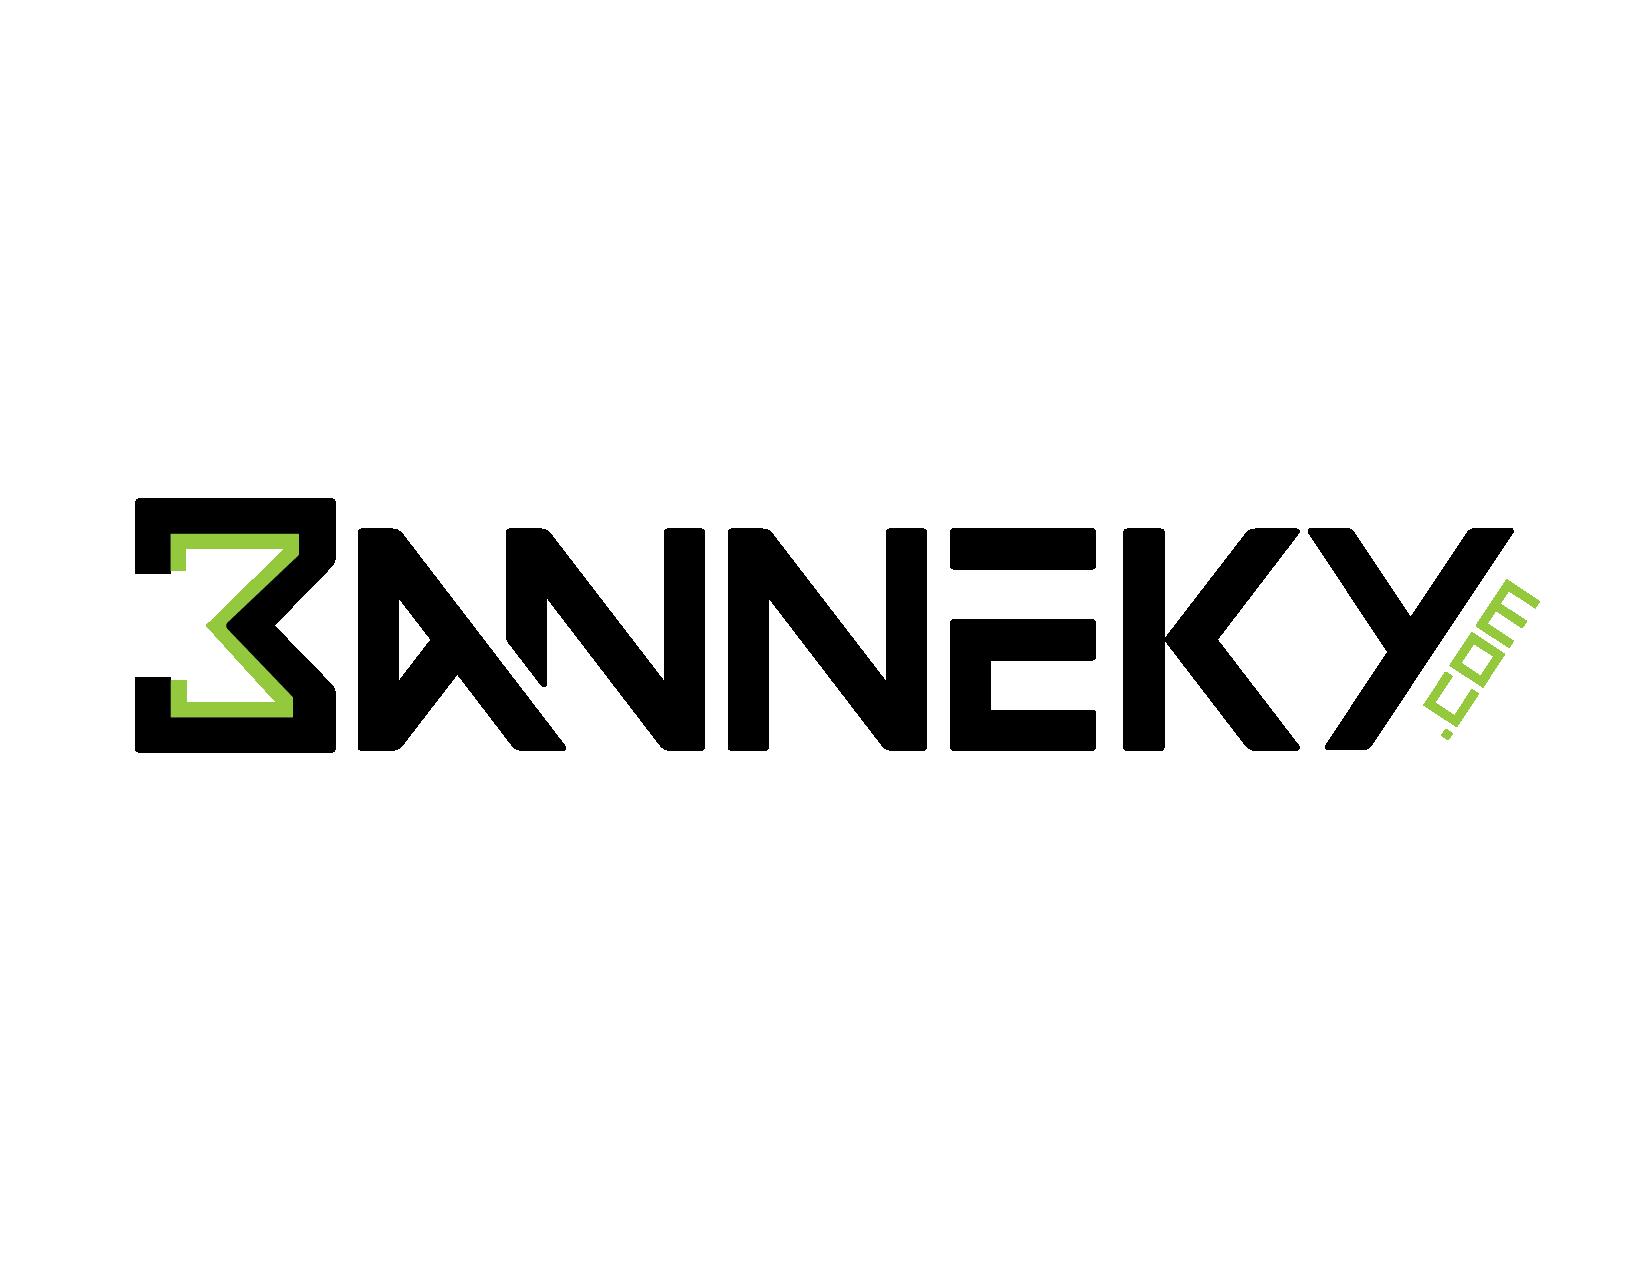 Banneky-Logo-Official-01